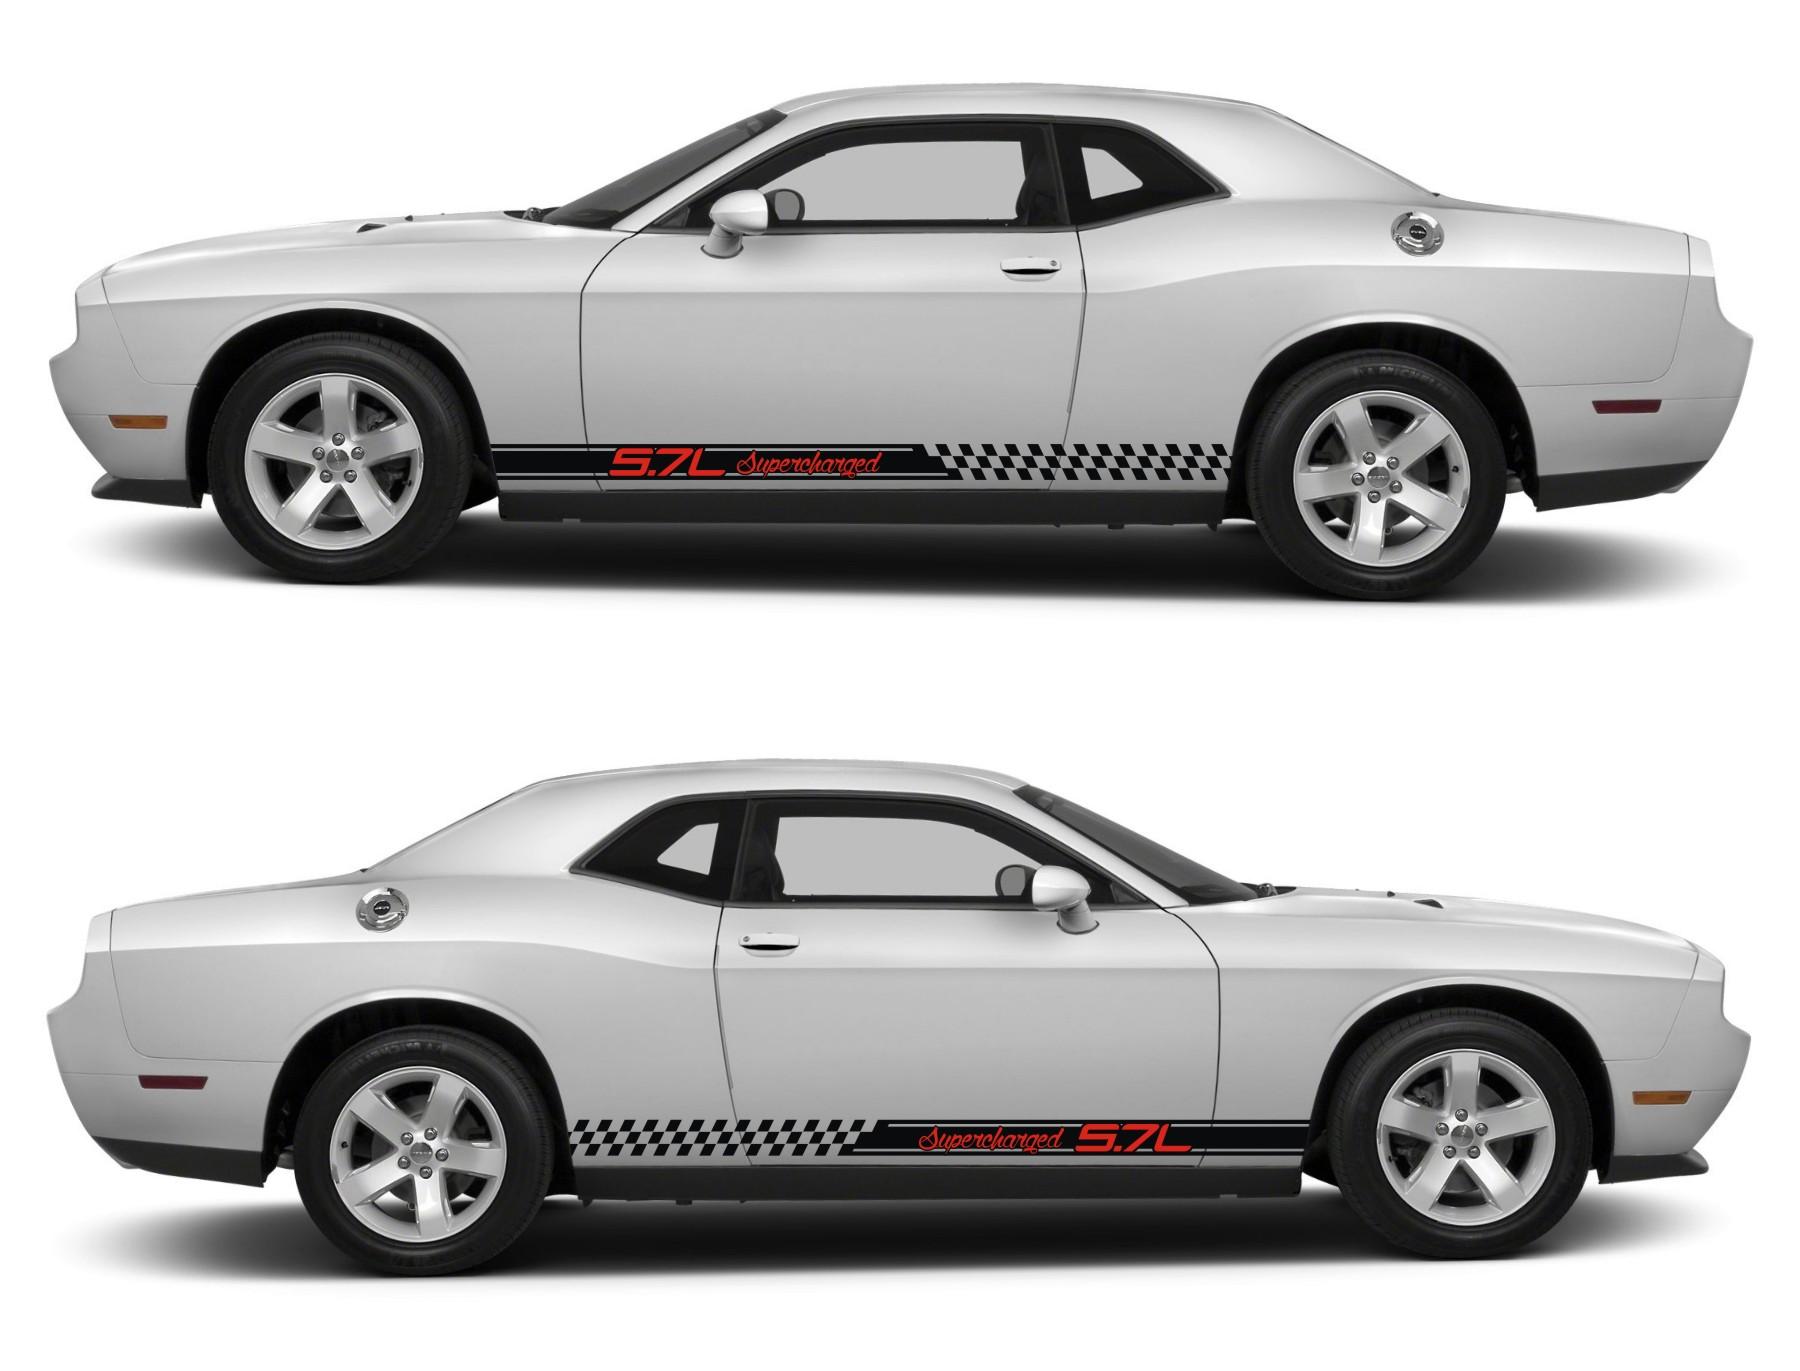 Spk213 Dodge Challenger Racing Stripes Sticker Decal Kit Srt Sxt